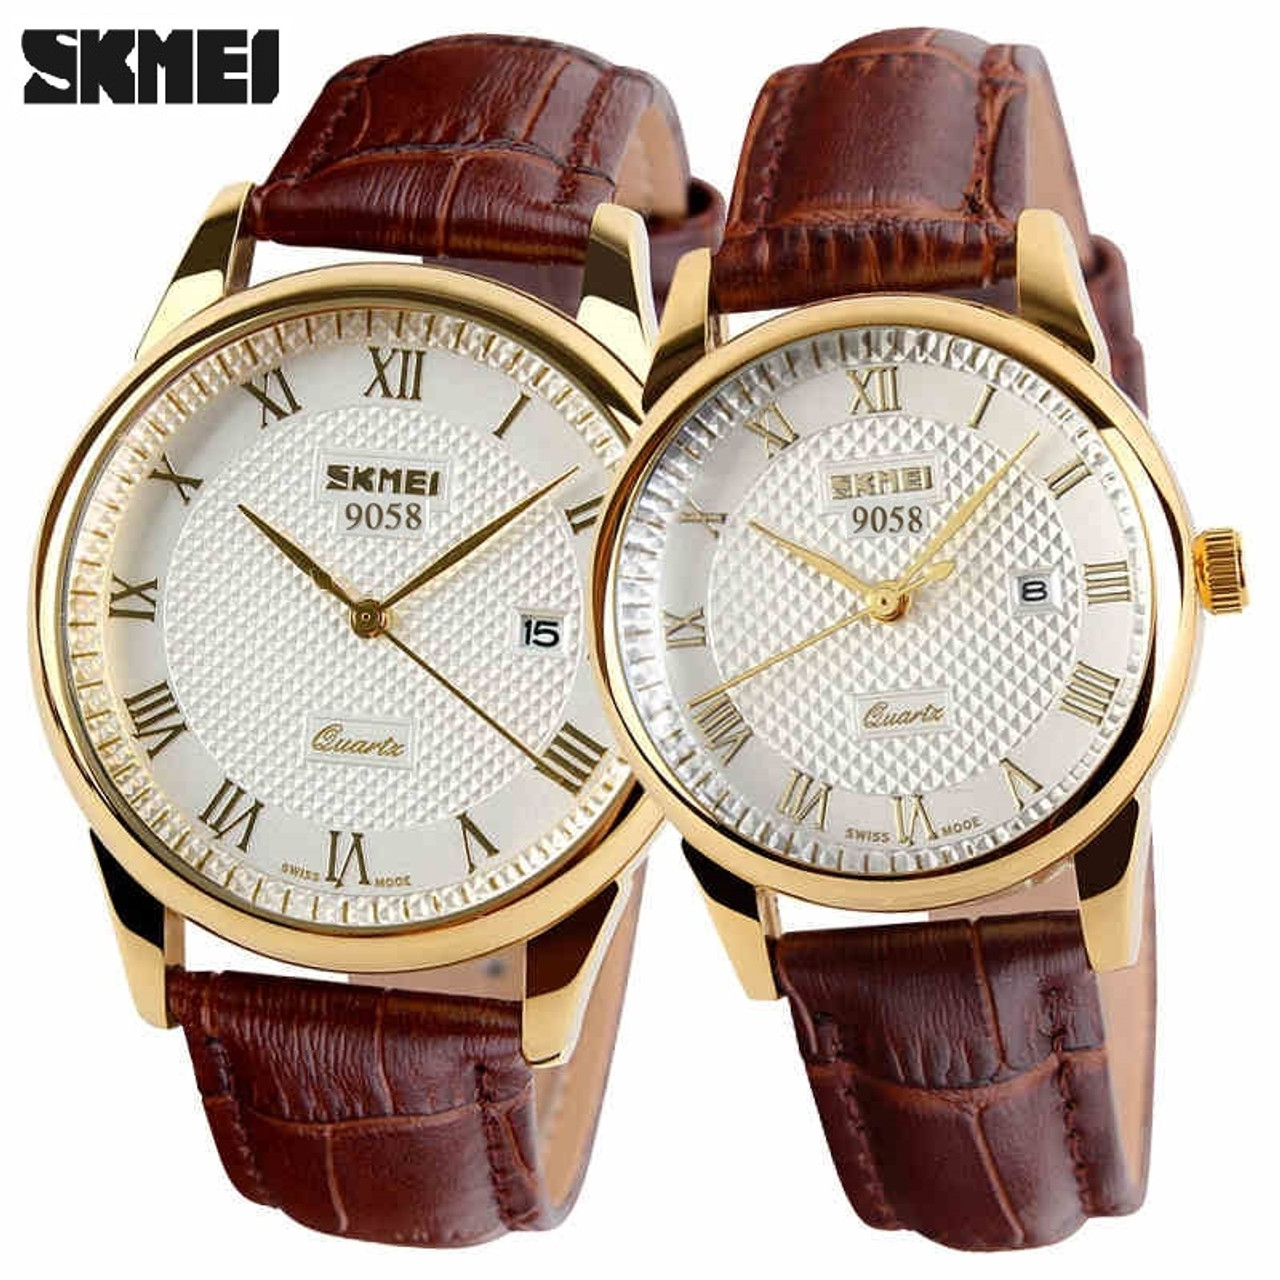 c05a303c9259 2017 SKMEI brand watches men quartz business fashion casual watch full  steel date women lover couple ...